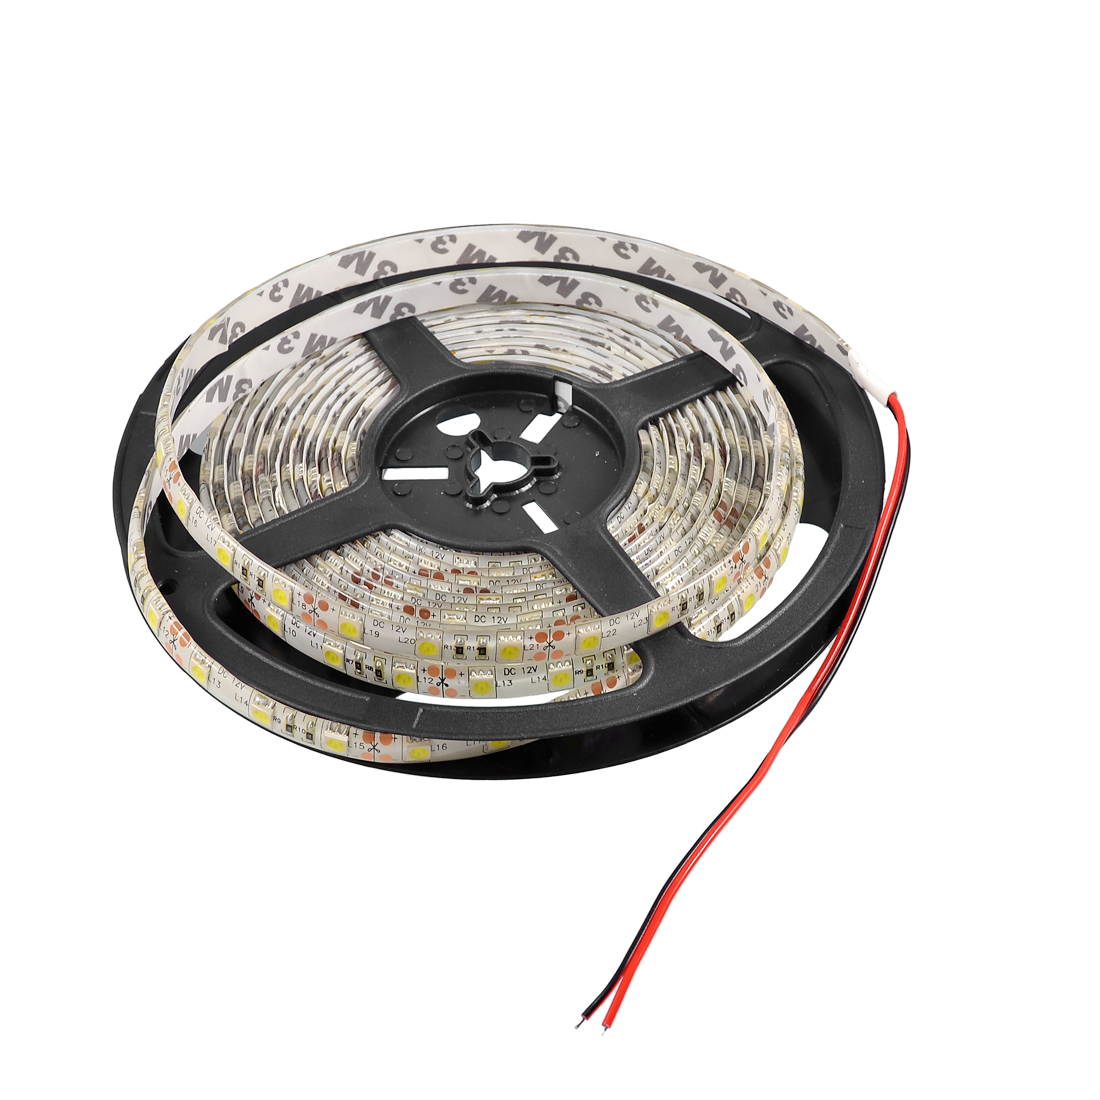 Car Auto Decorative 5M 5050 Cool White 300 SMD LED Flexible Strip Light